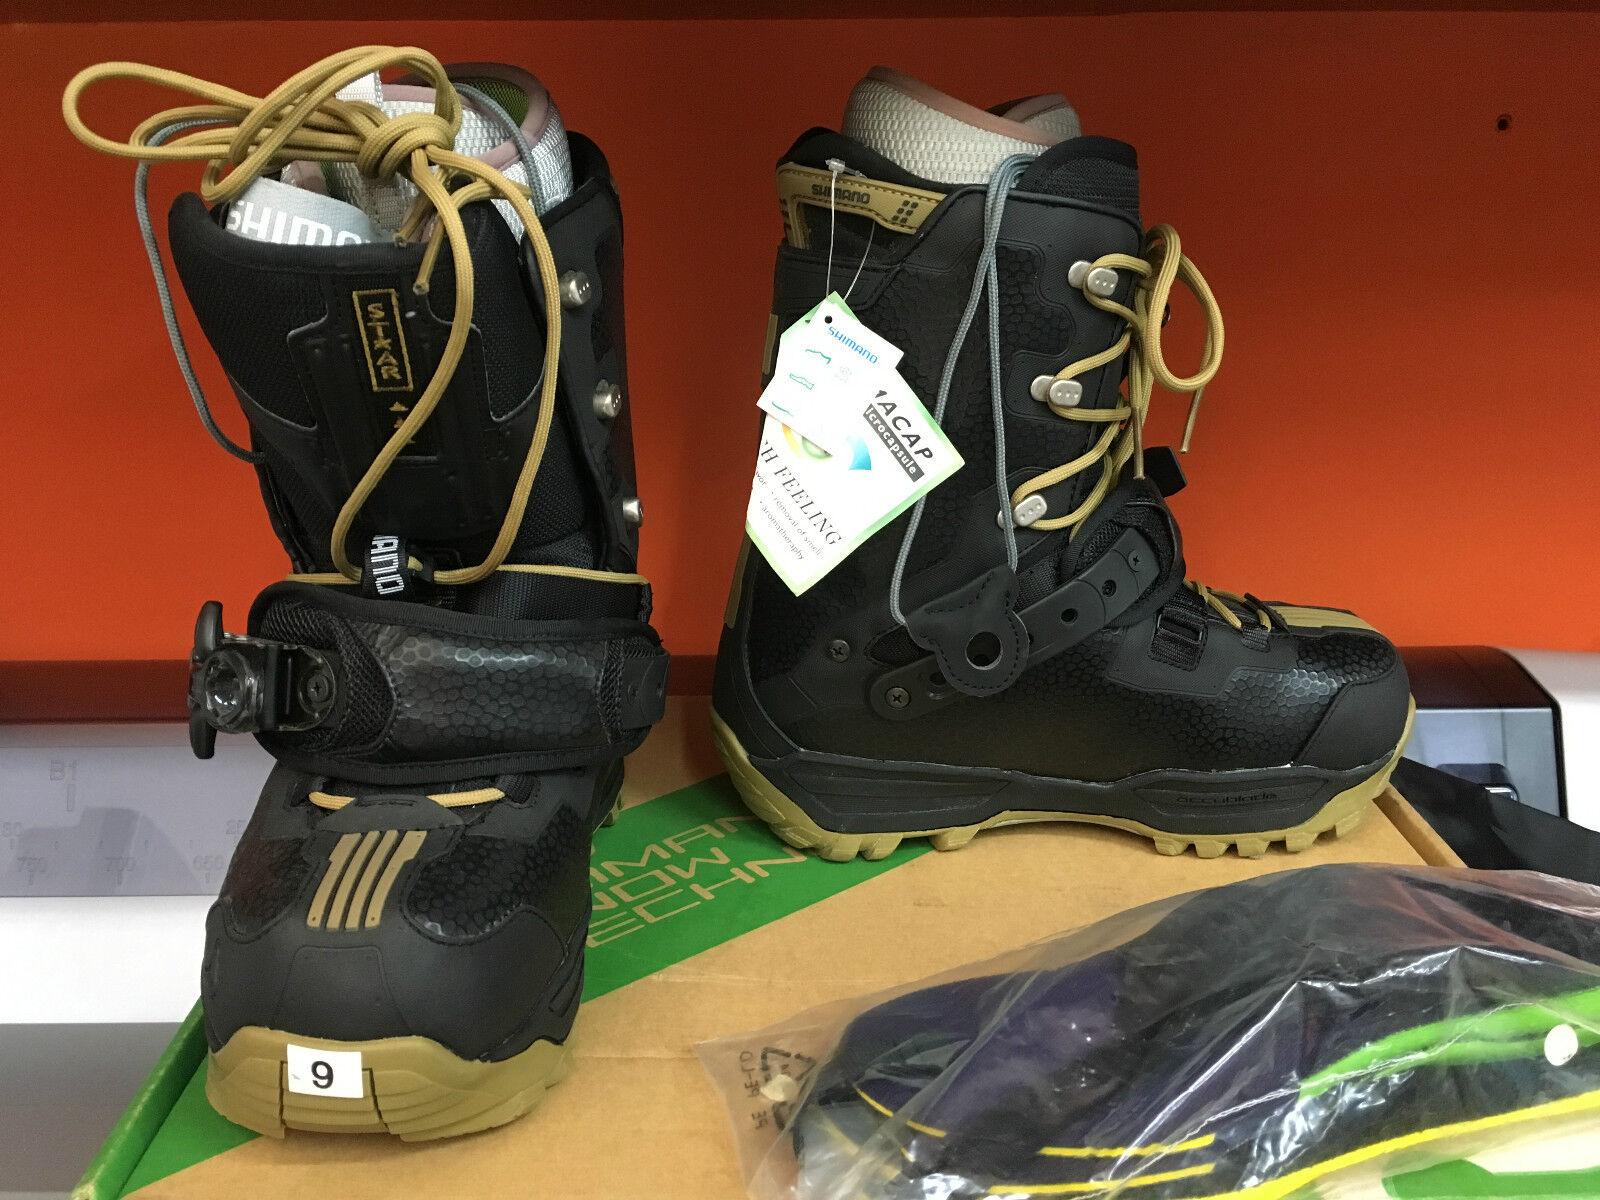 Scarponi Tripper ST AR Shimano Shimano Shimano snowboard stivali US 9 9716f0